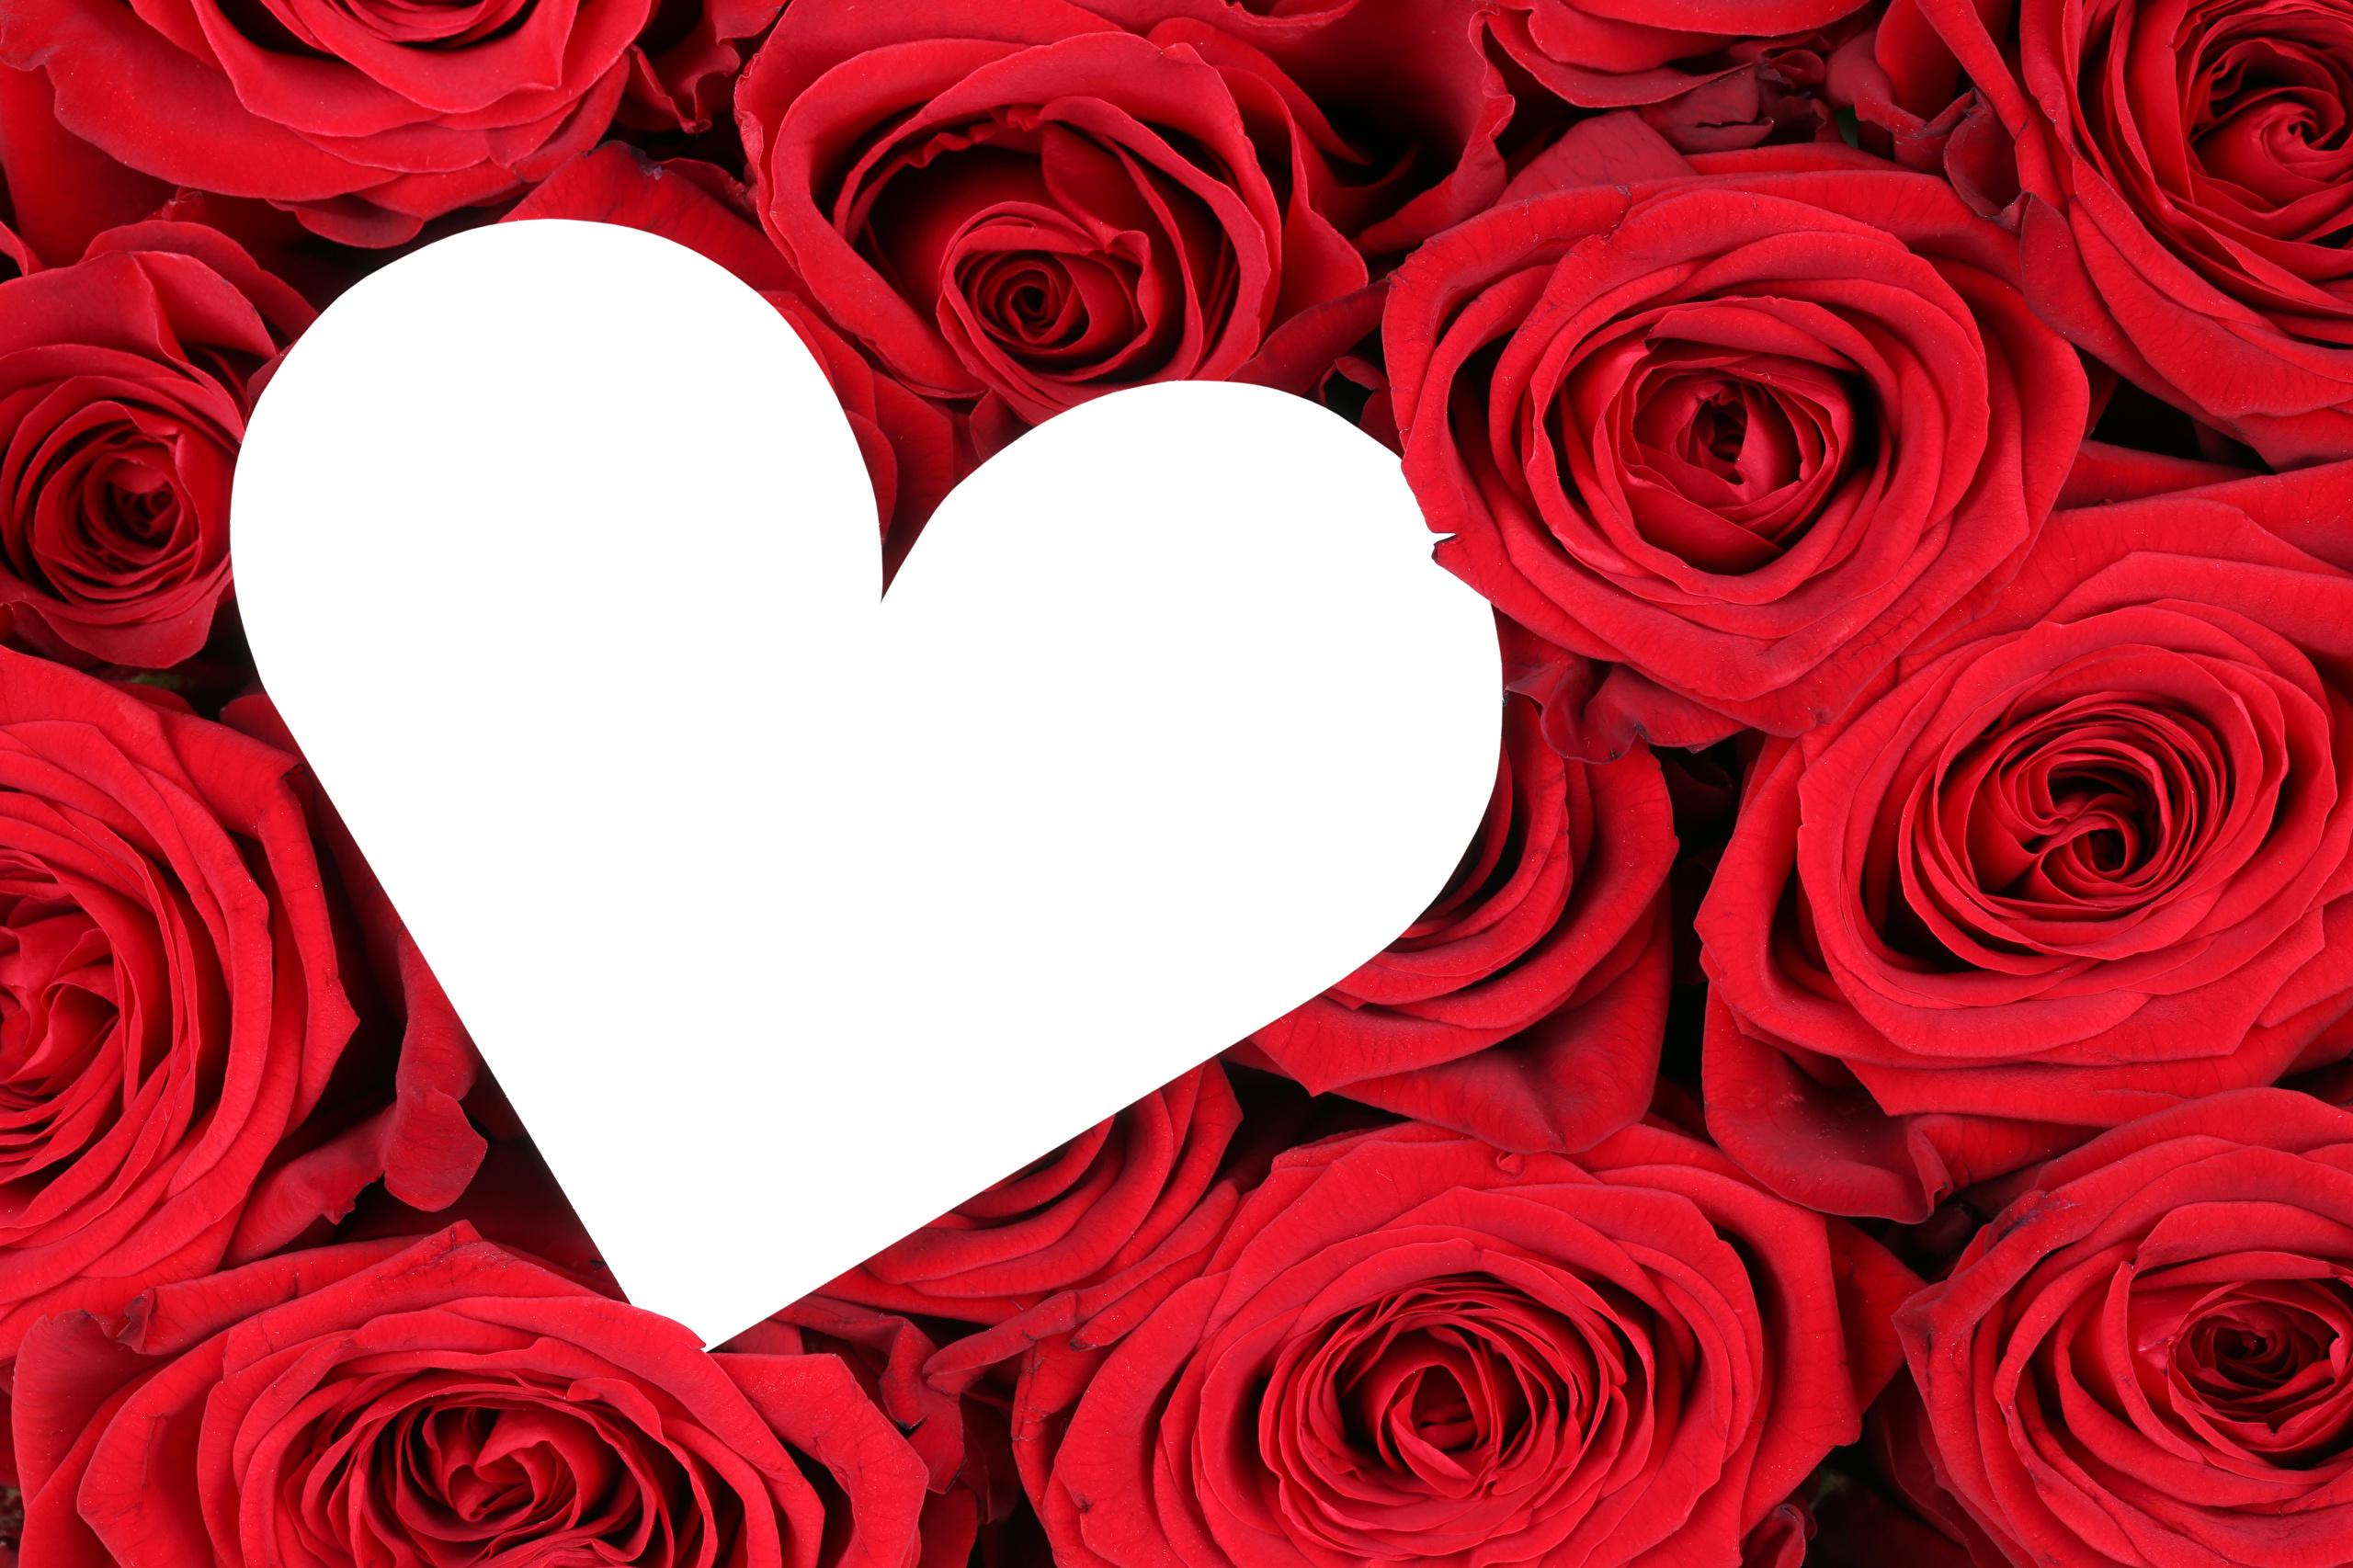 Desktop Wallpapers Heart Red Roses Flowers Template 2560x1706